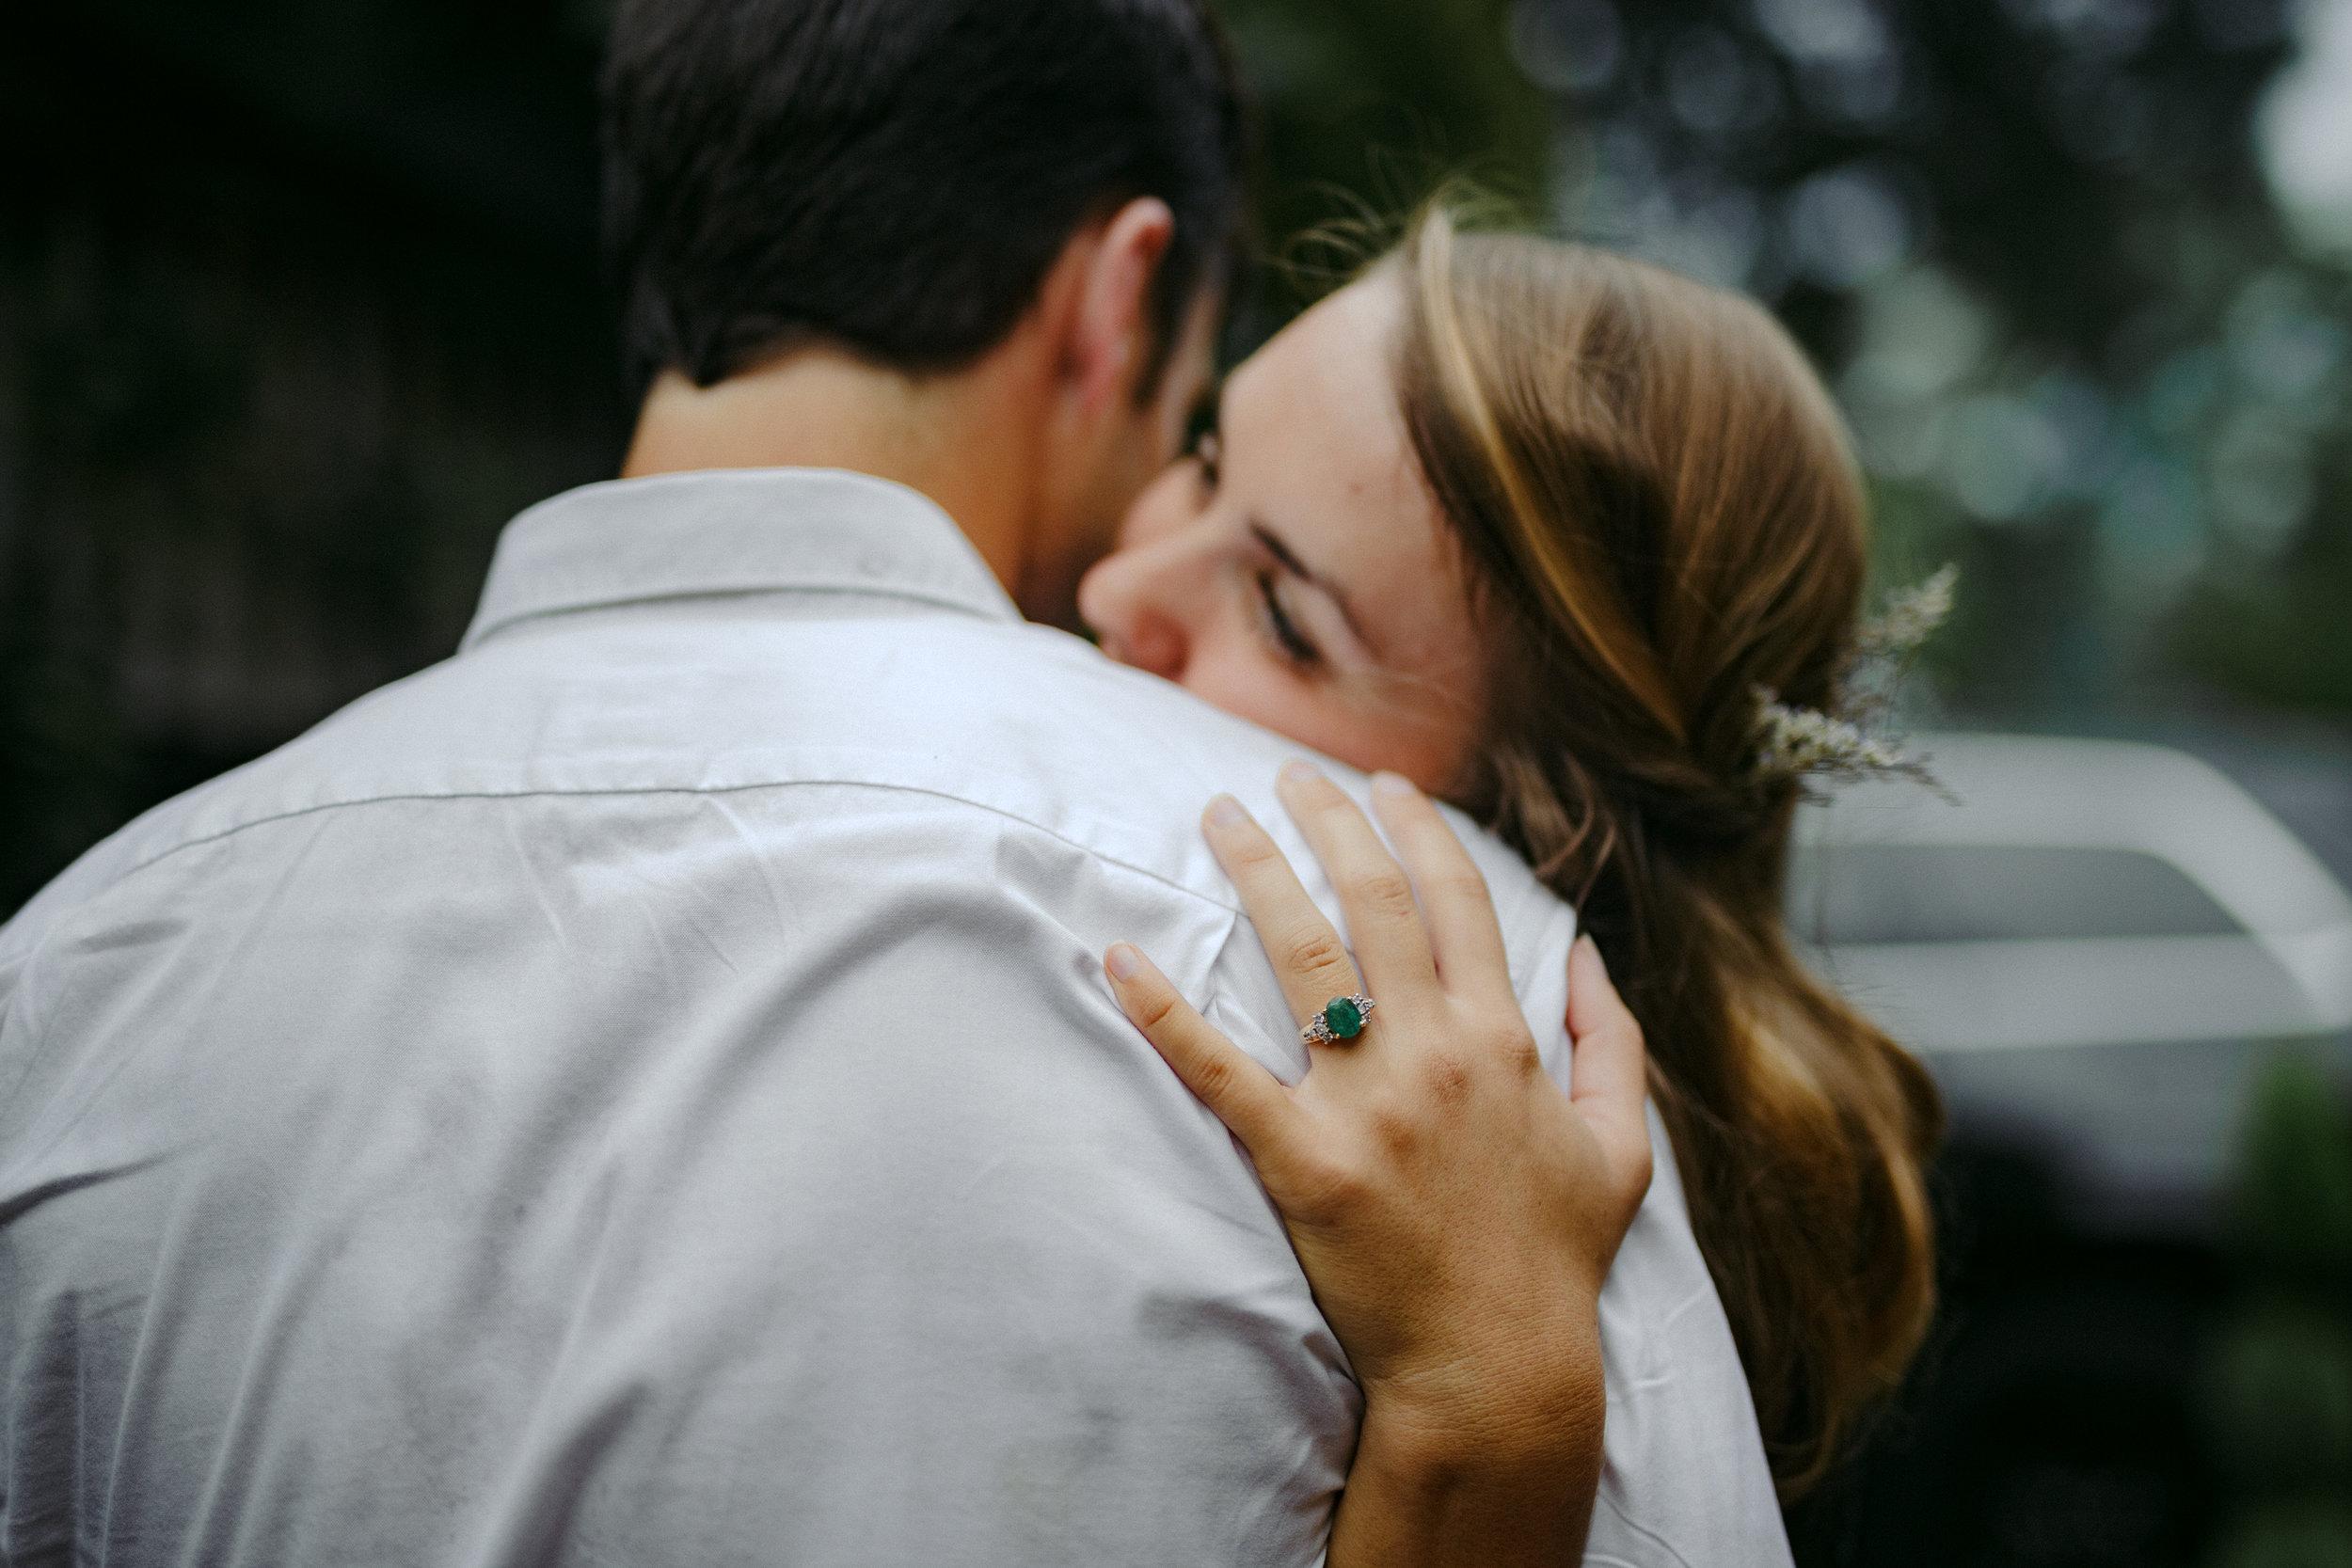 richmond_wedding_photographer-8.jpg